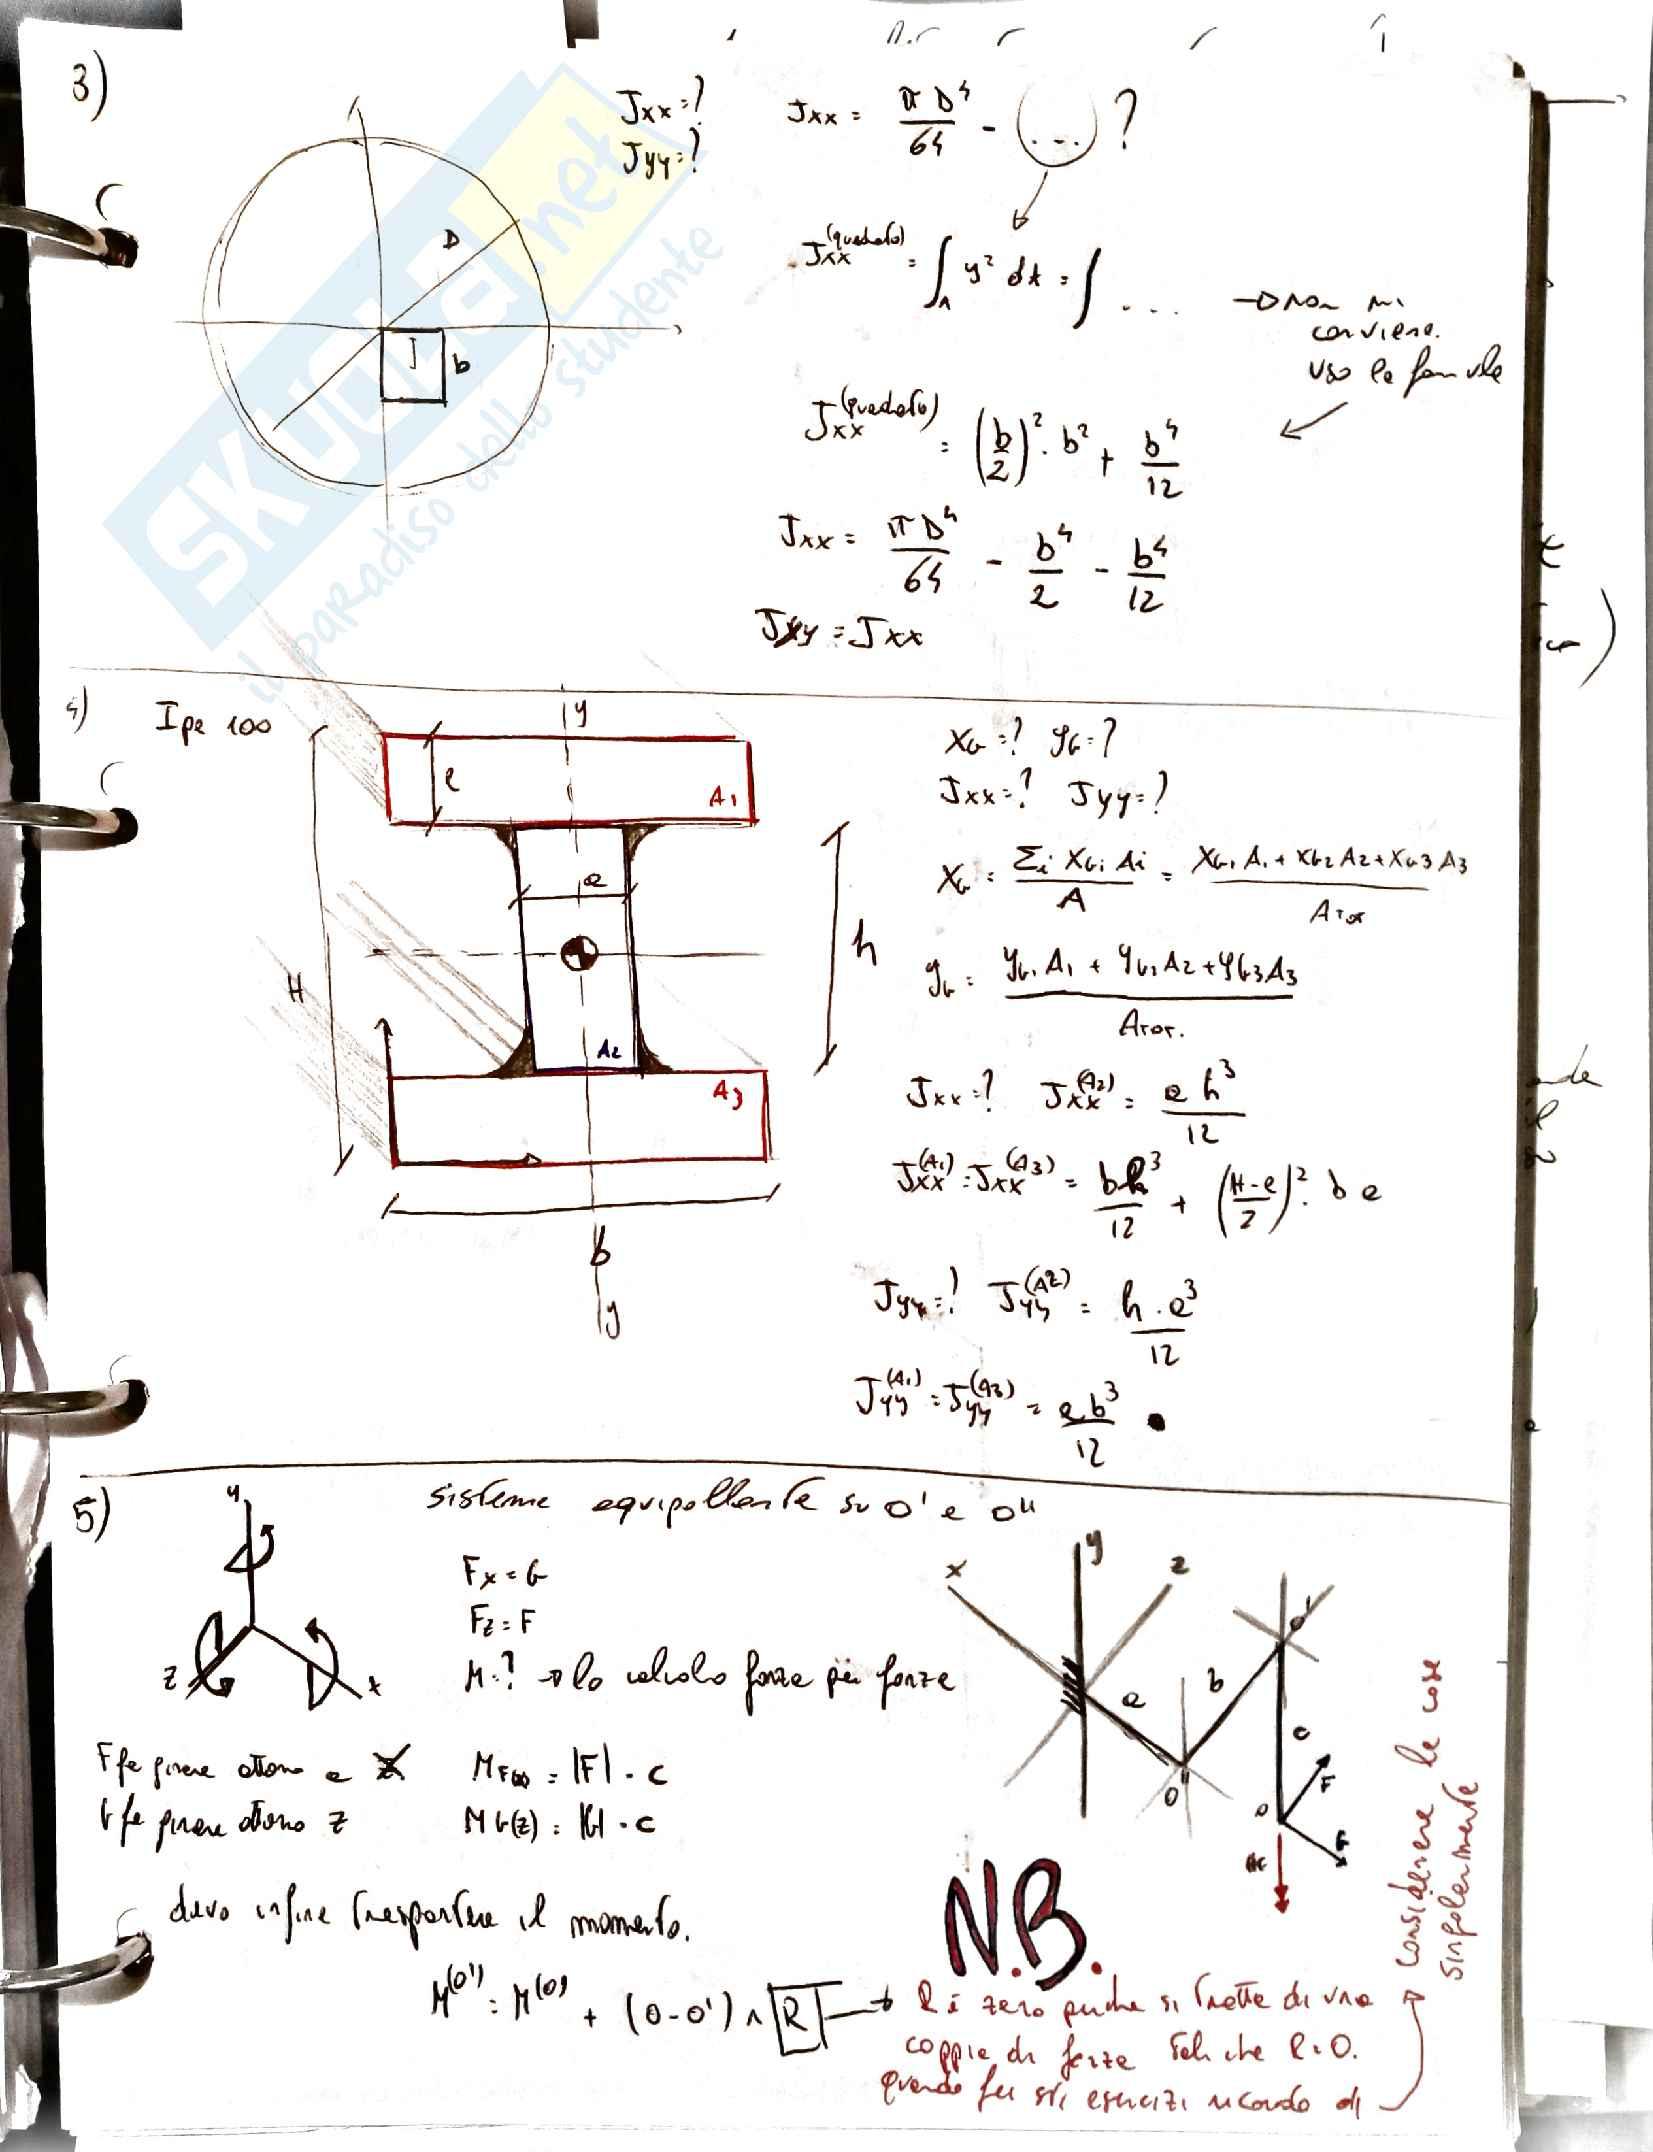 Esercitazioni costruzione di macchine 1 Pag. 6